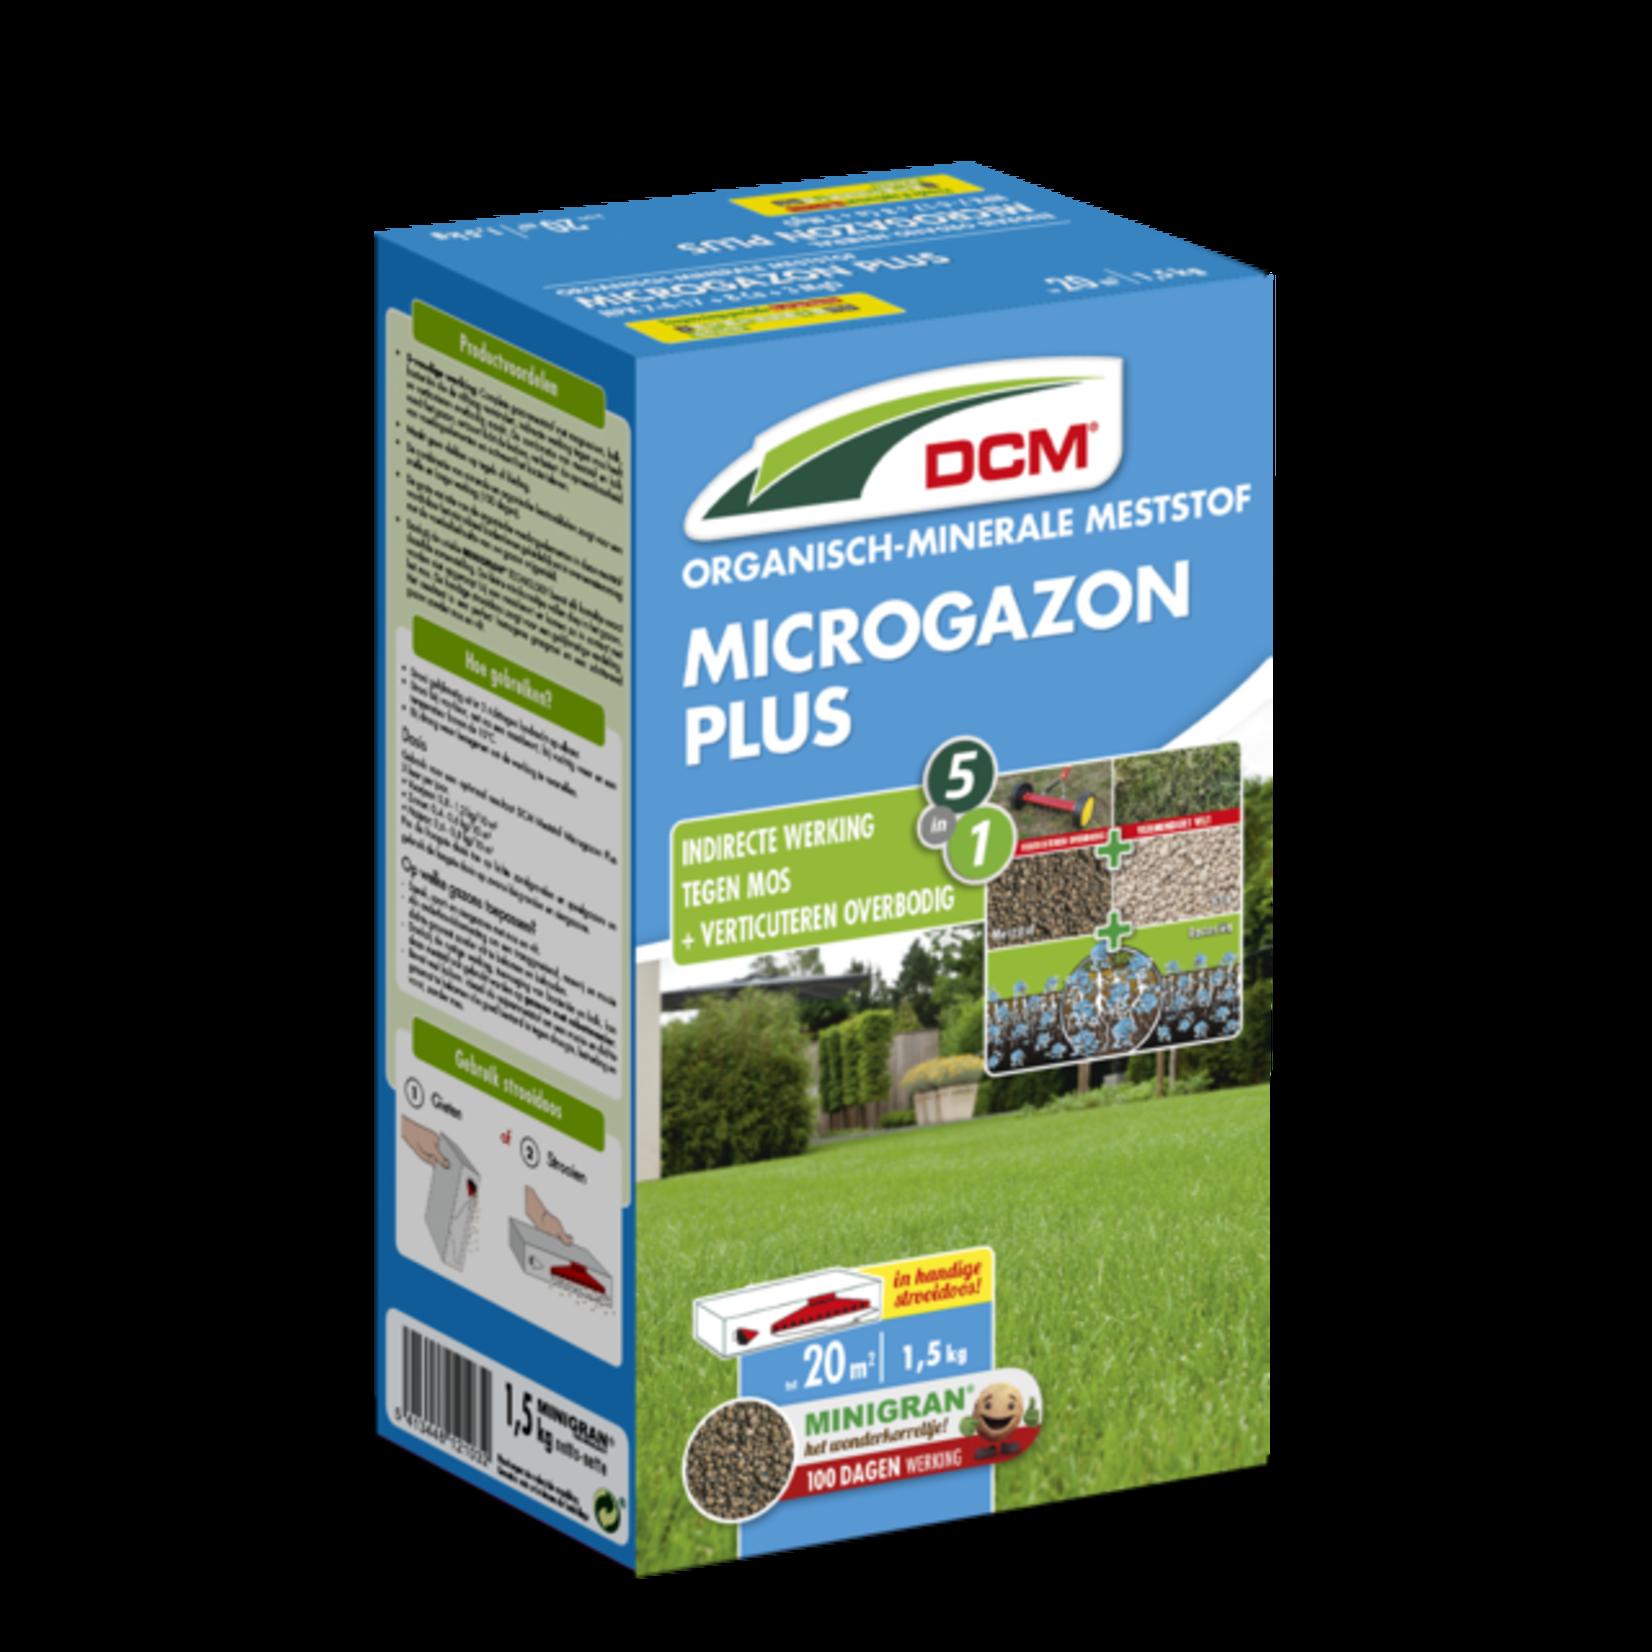 DCM Microgazon Plus